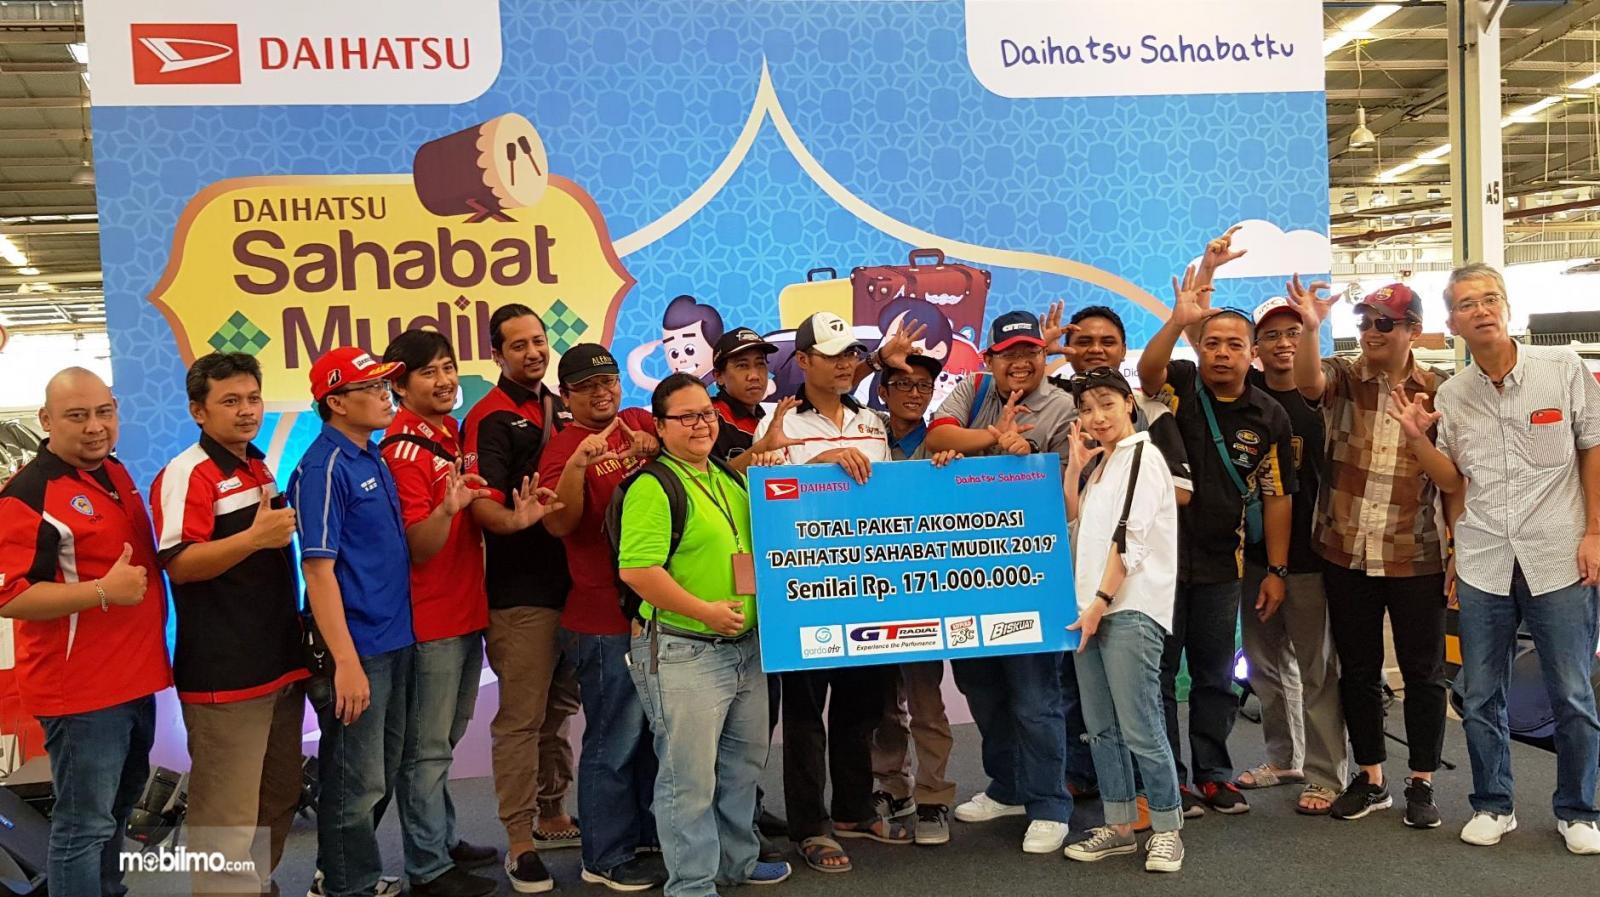 Tampak pembagian paket simbolis Daihatsu Sahabat Mudik 2019